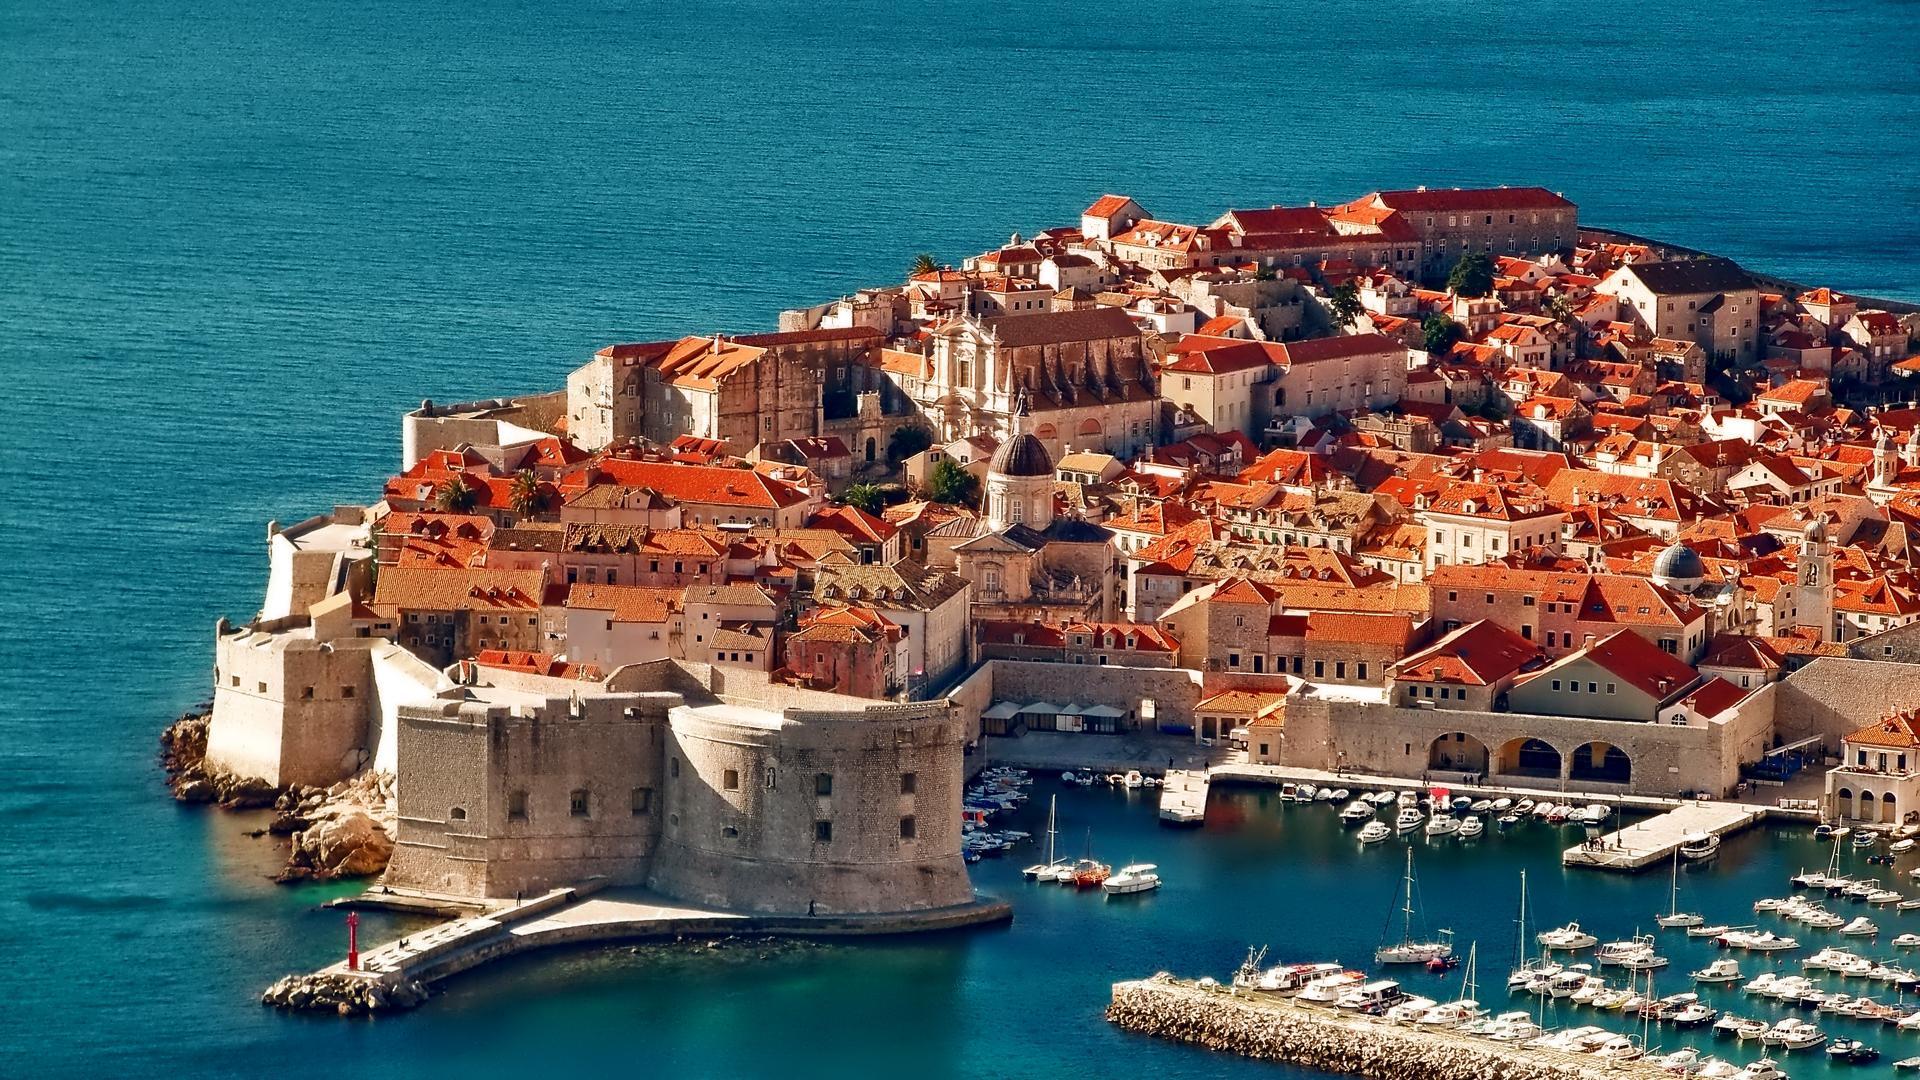 http://www.nenehschoice.nl/wp-content/uploads/2015/11/Dubrovnik.jpg